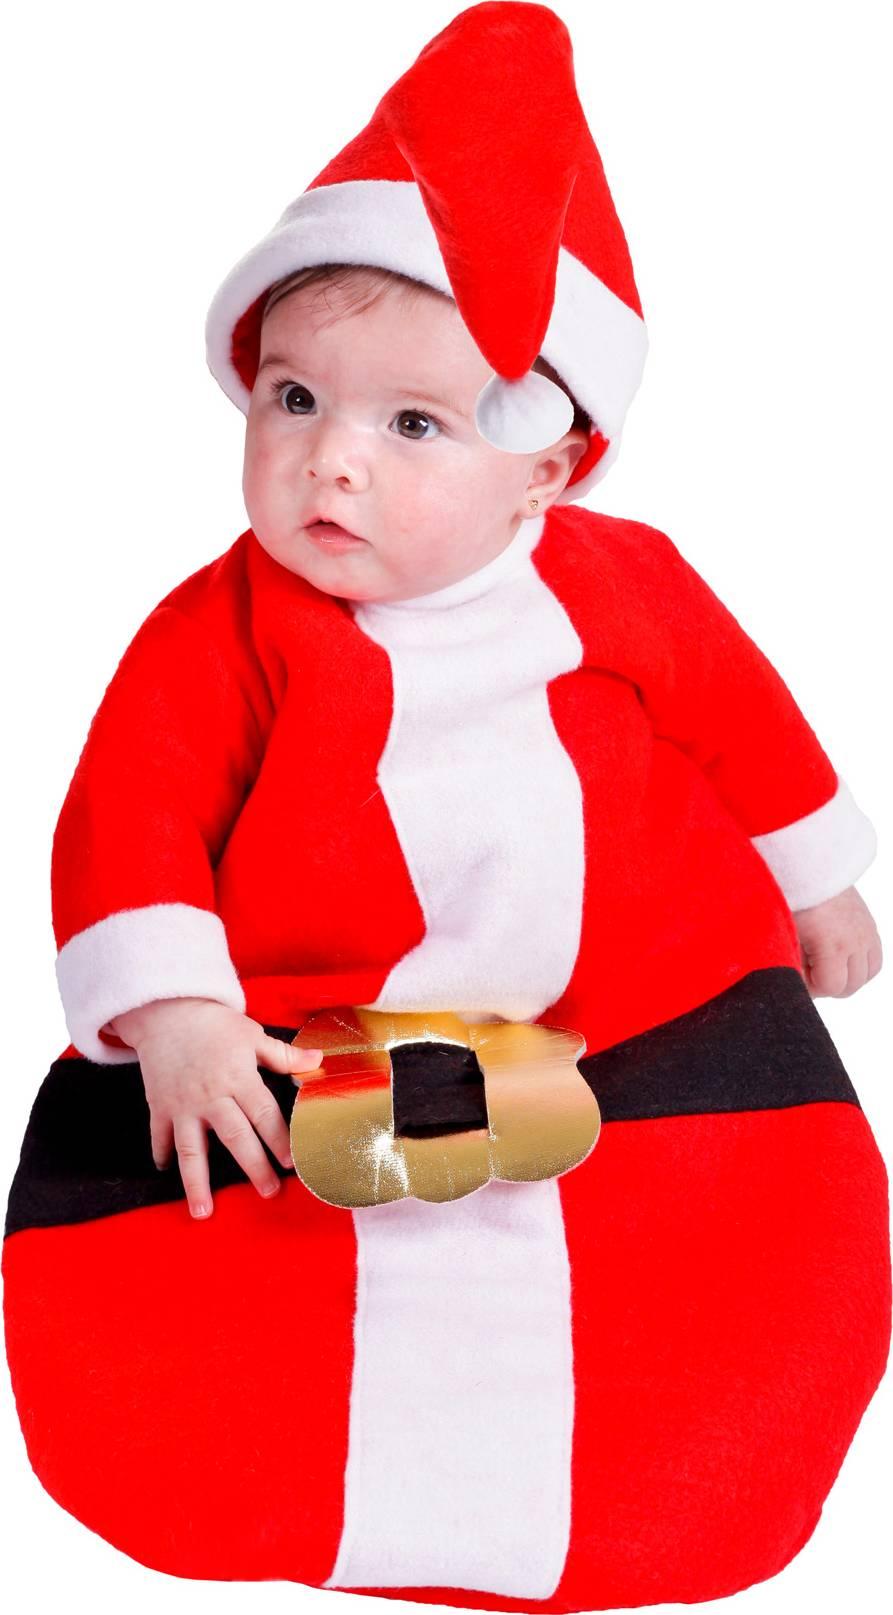 weihnachtskost m f r babys kost me f r kinder und g nstige faschingskost me vegaoo. Black Bedroom Furniture Sets. Home Design Ideas